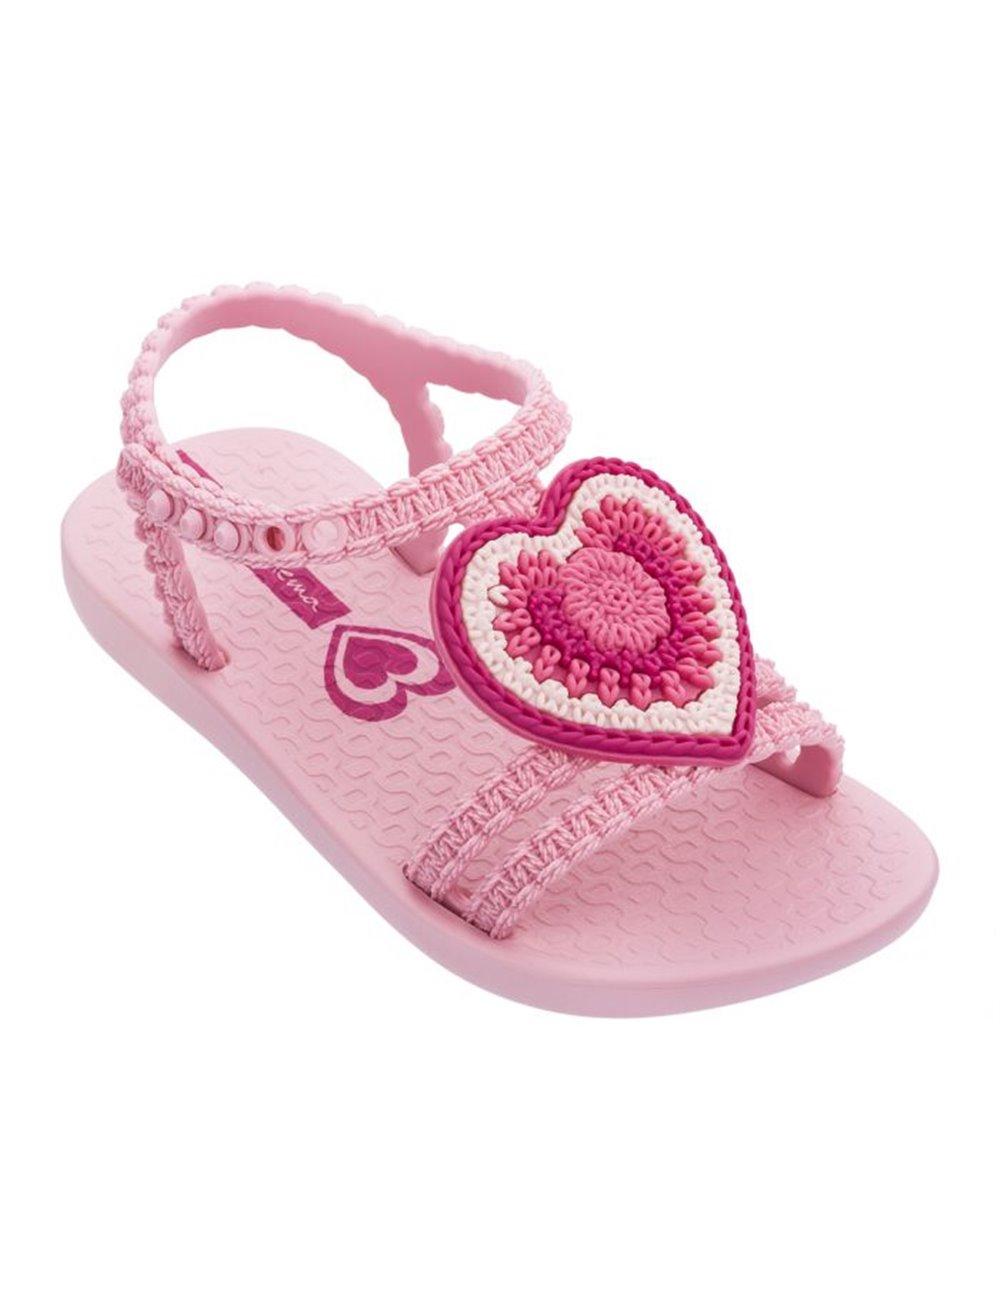 Sandalias My First Ipanema V Baby 82780 Rosa